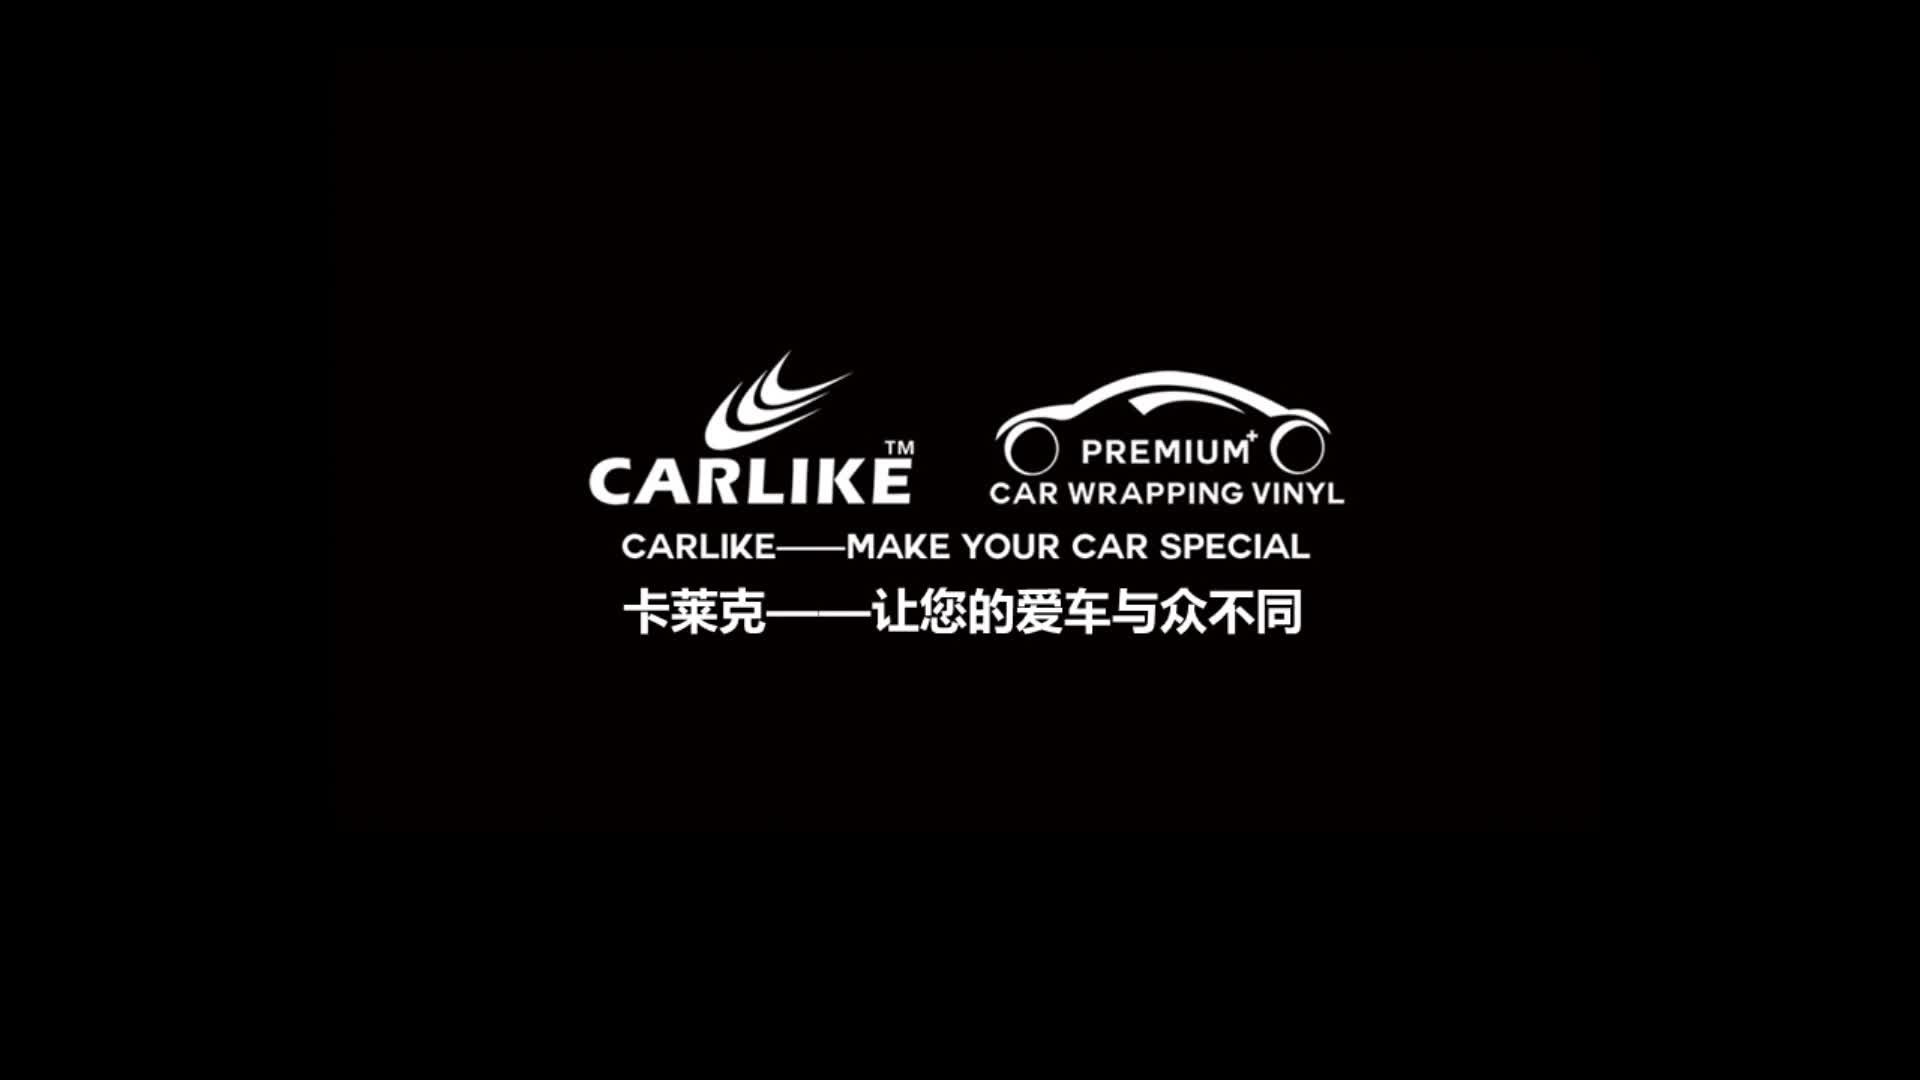 CARLIKE Wholesale PVC Material Chrome Mirror Car Wrap Vinyl Foil